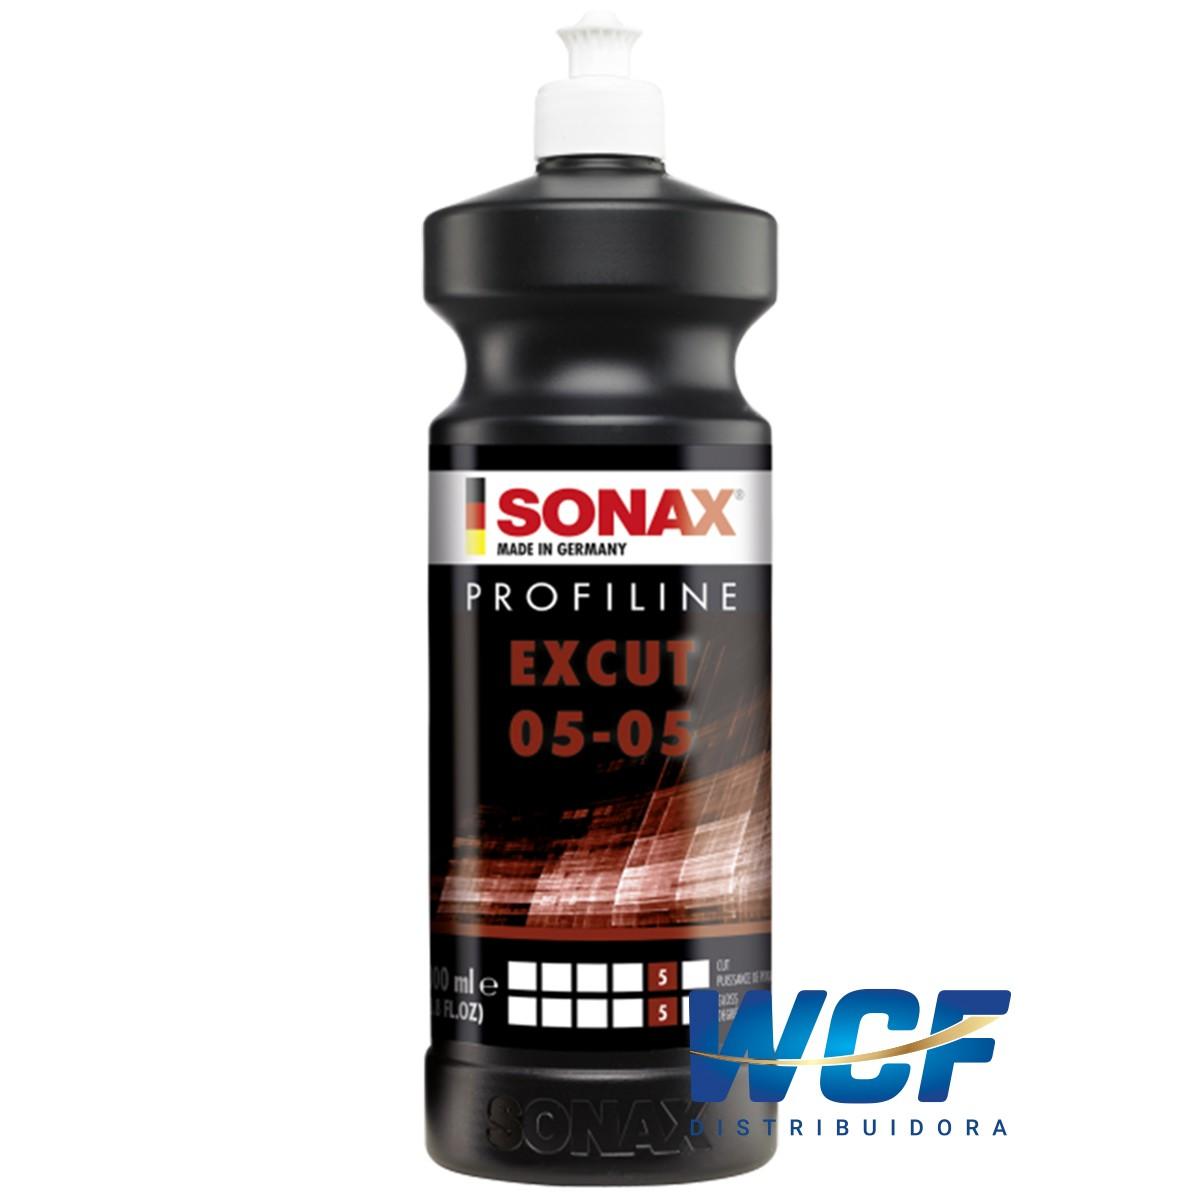 SONAX PROFILINE EXCUT 05 05